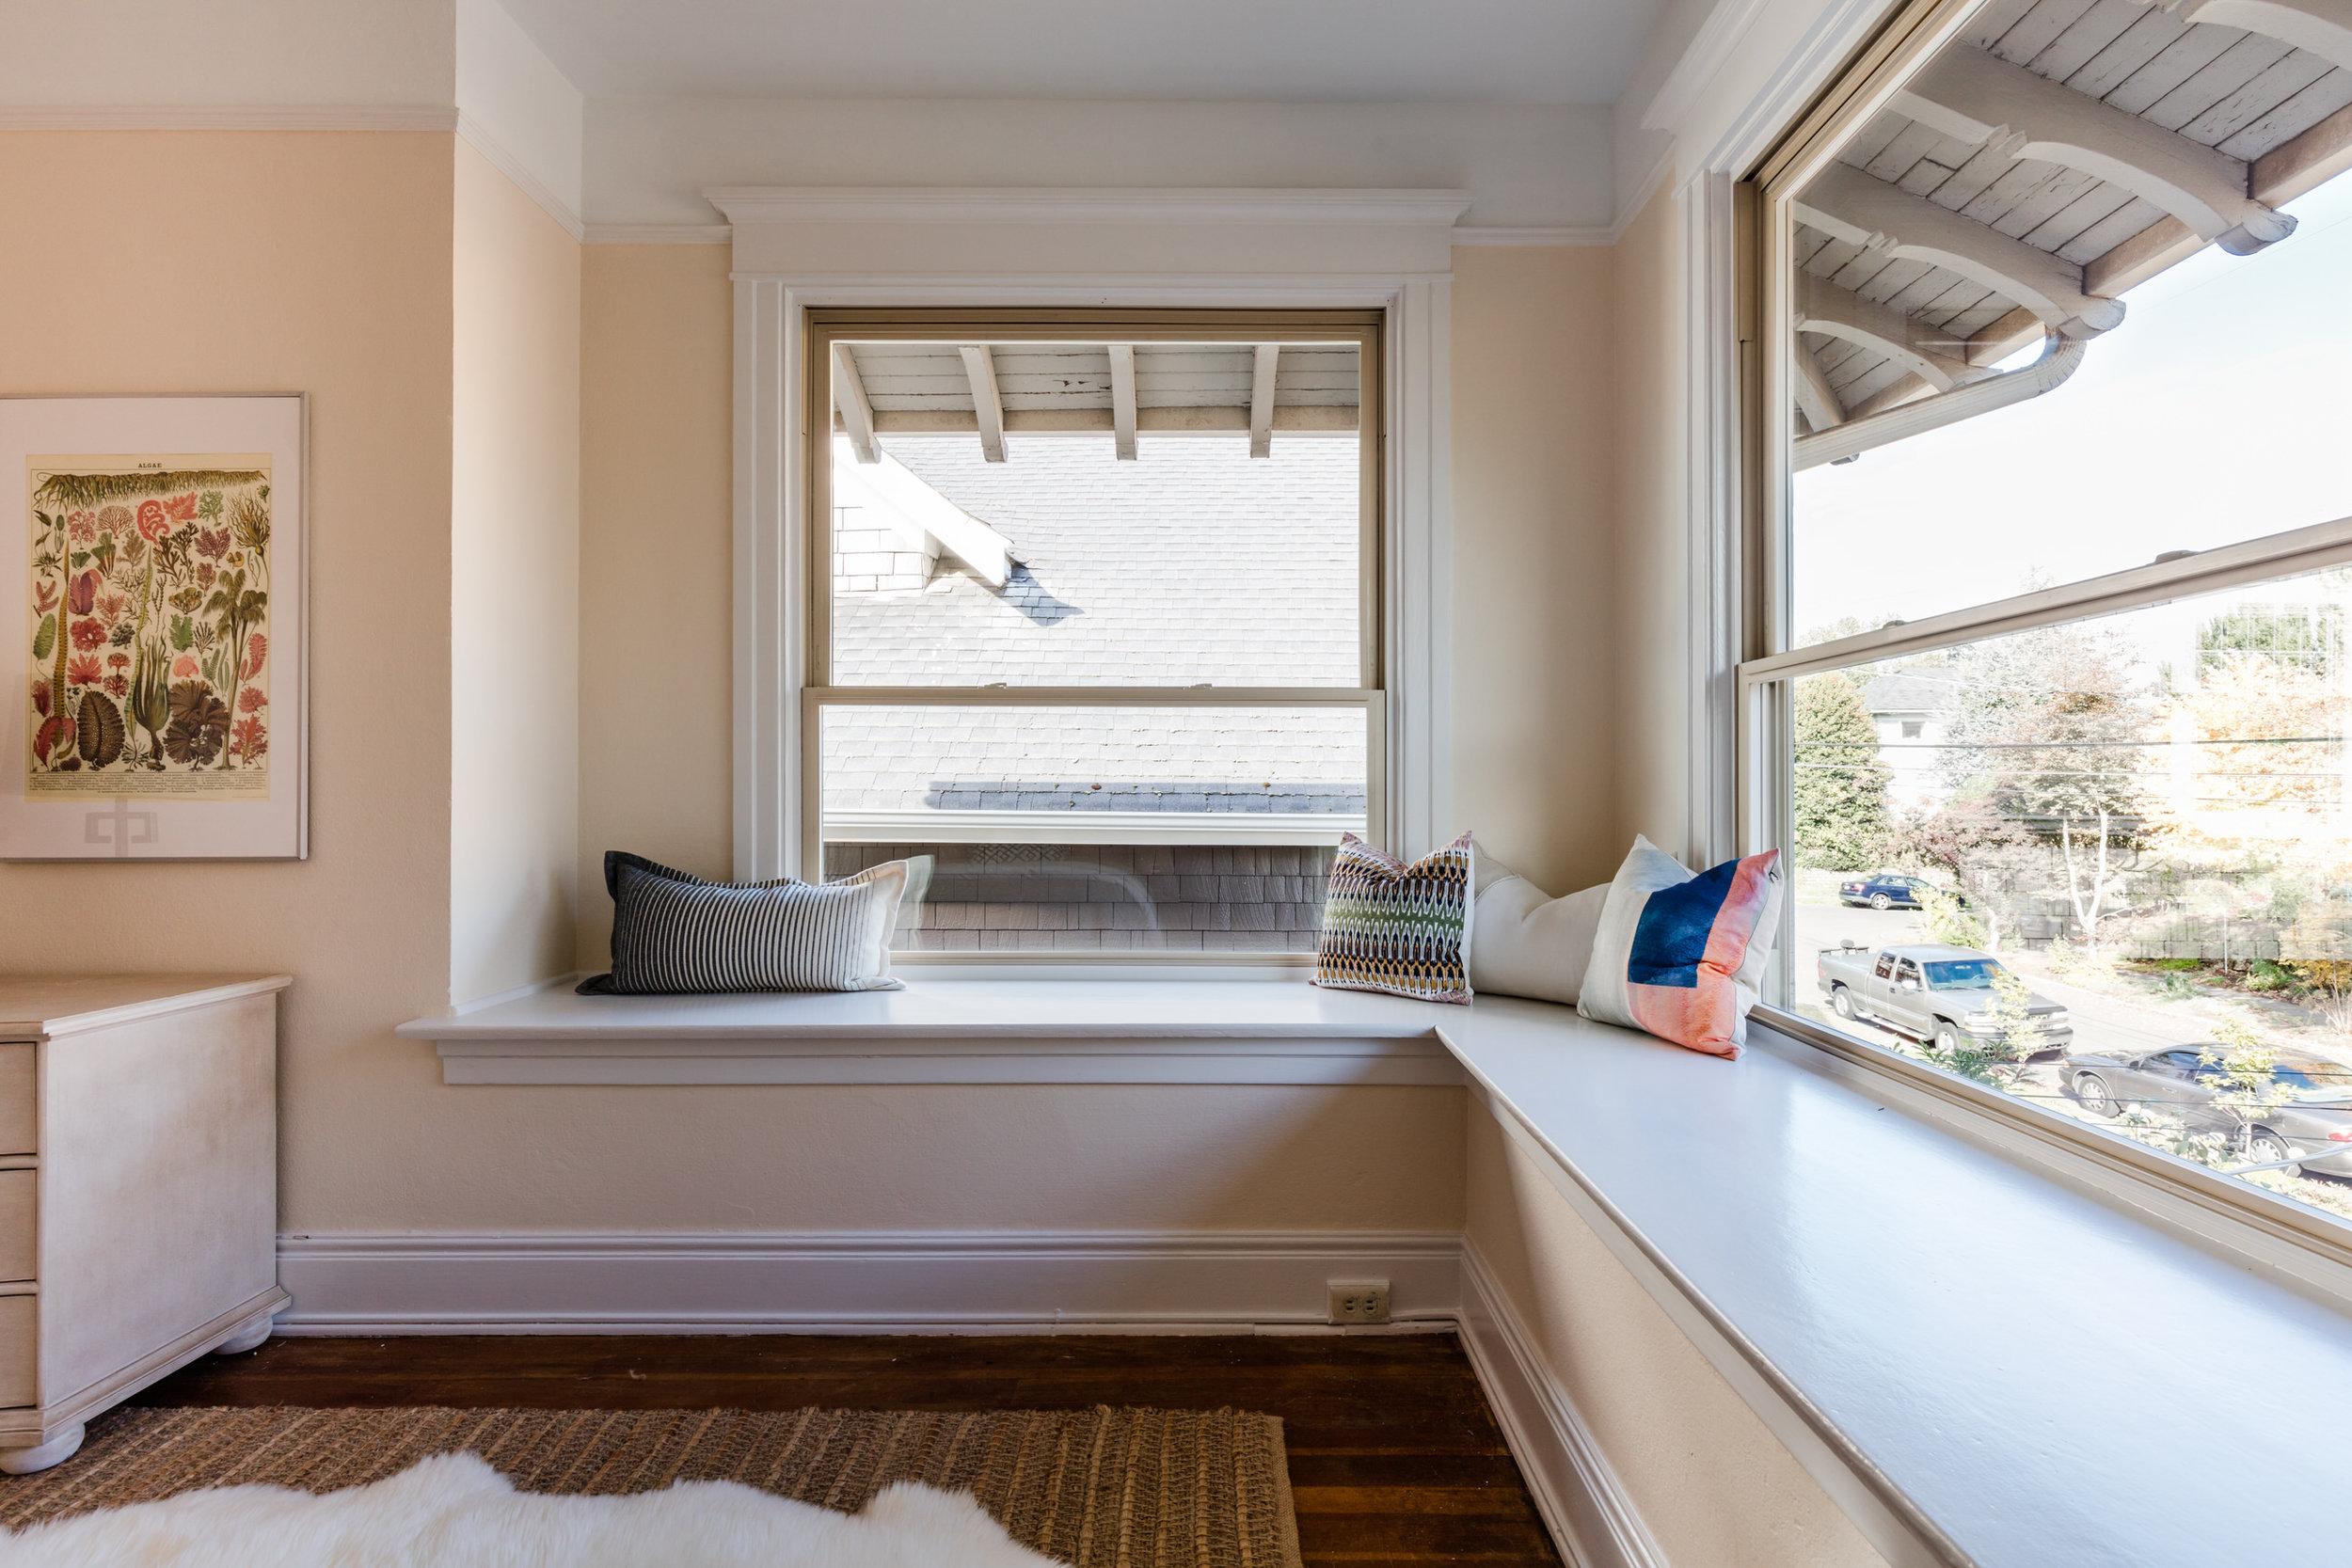 0005-Miranda-Estes-Architectural-Photography-Anne-W-Nelson-33rd Ave-20181011.jpg